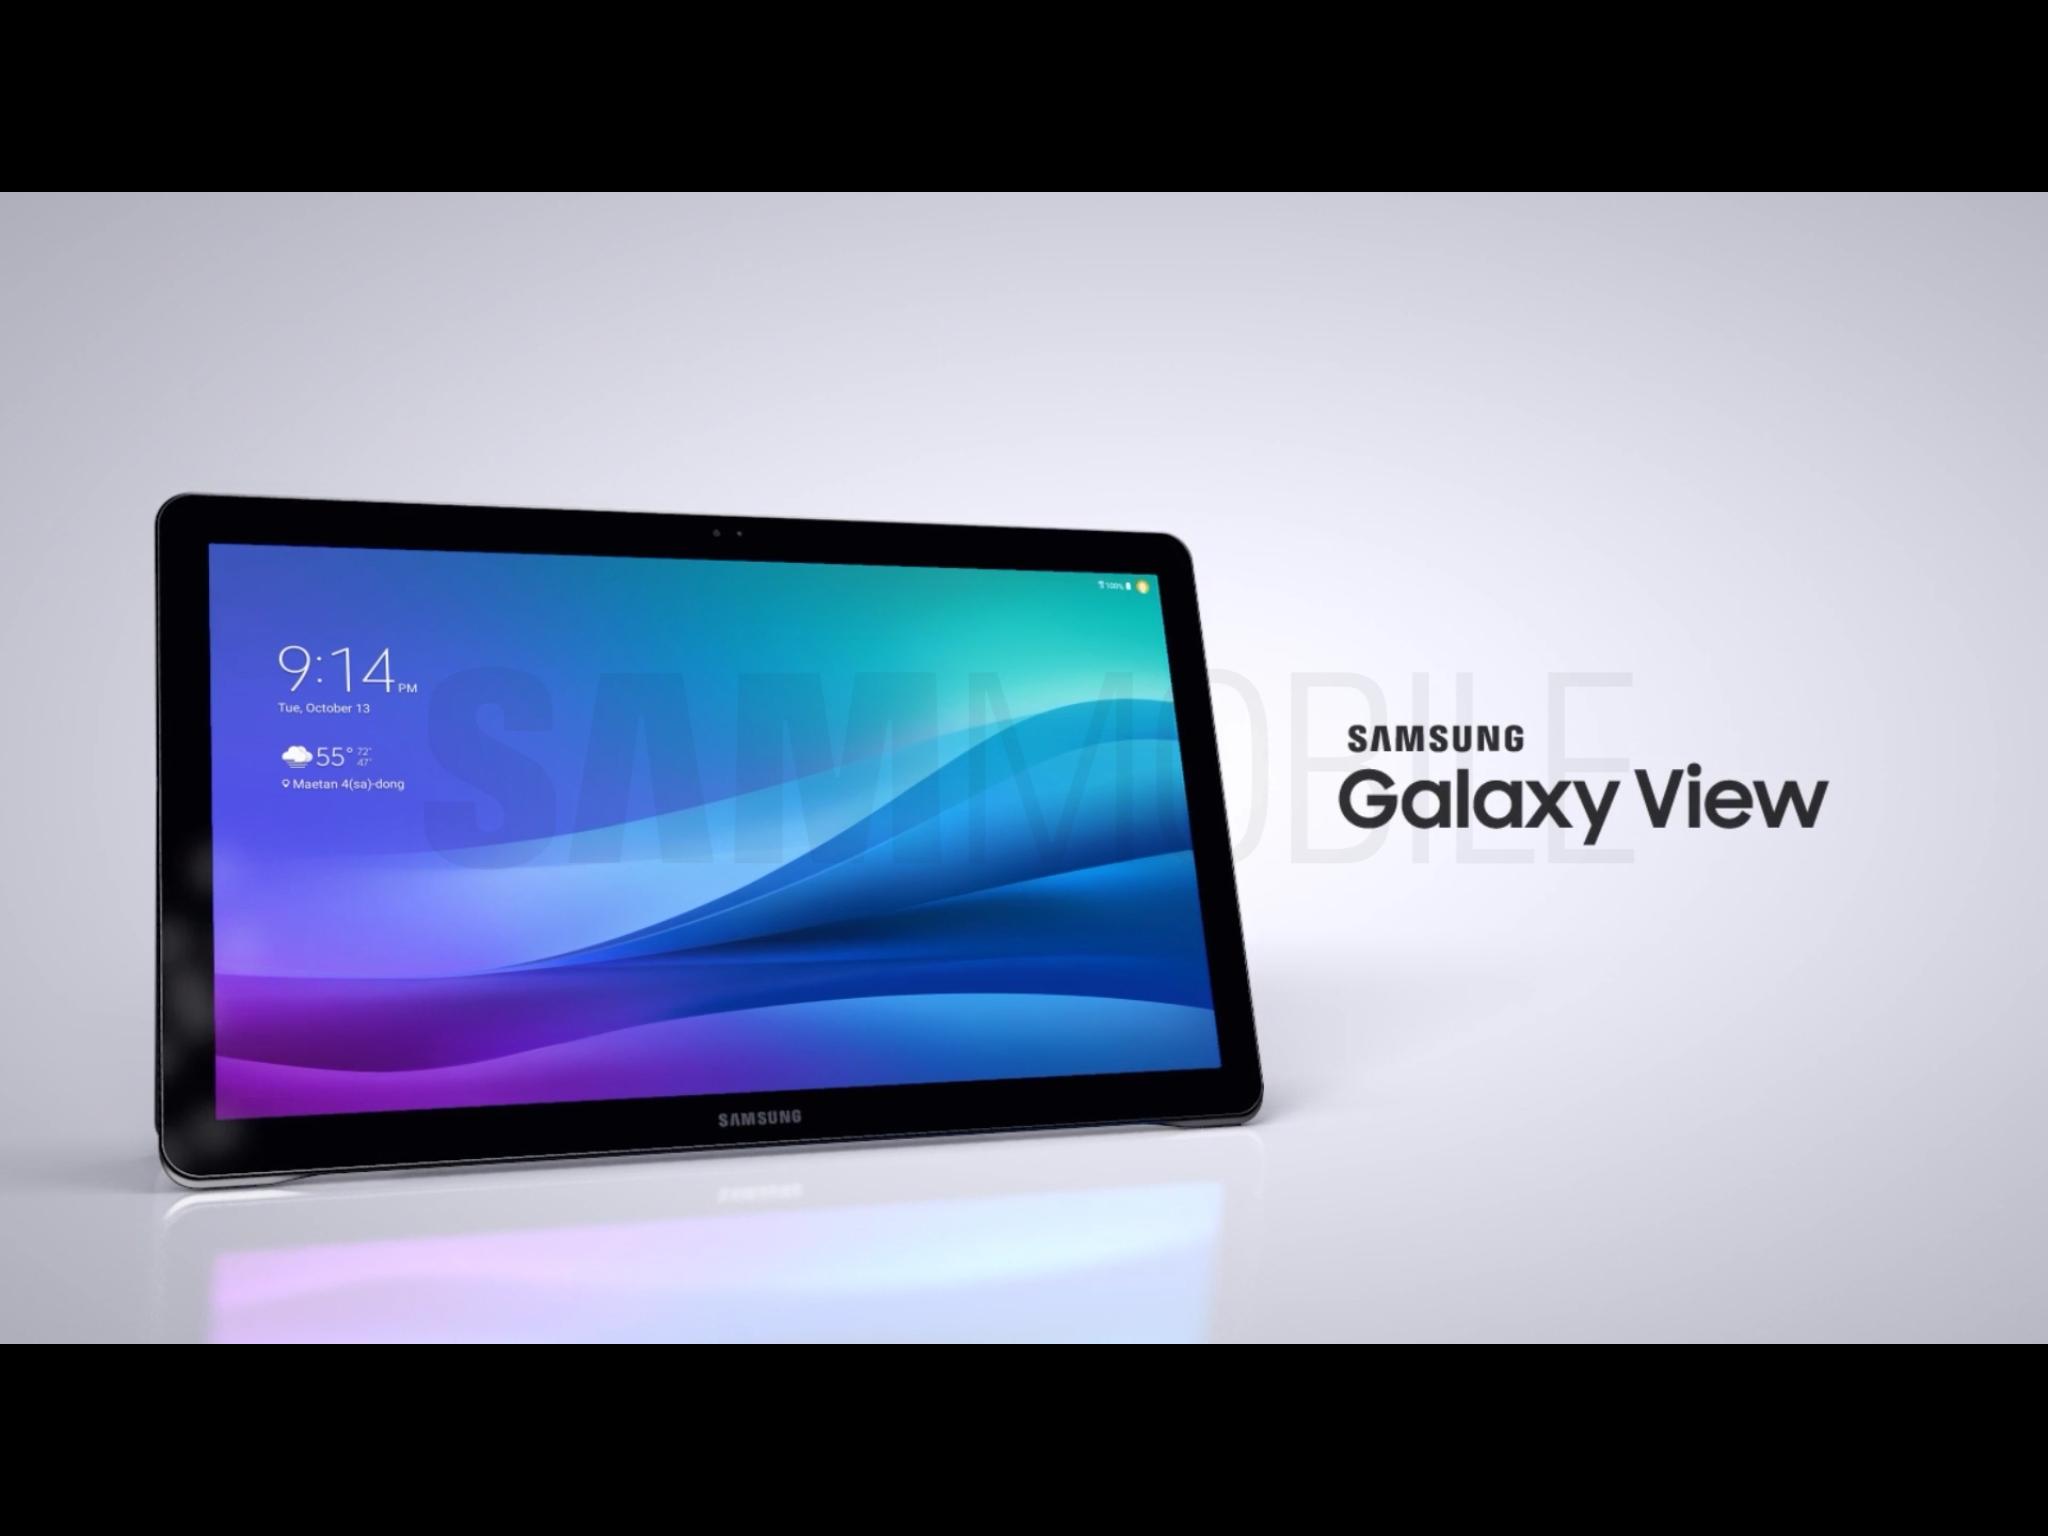 Samsung-Galaxy-View-SamMobile_0271